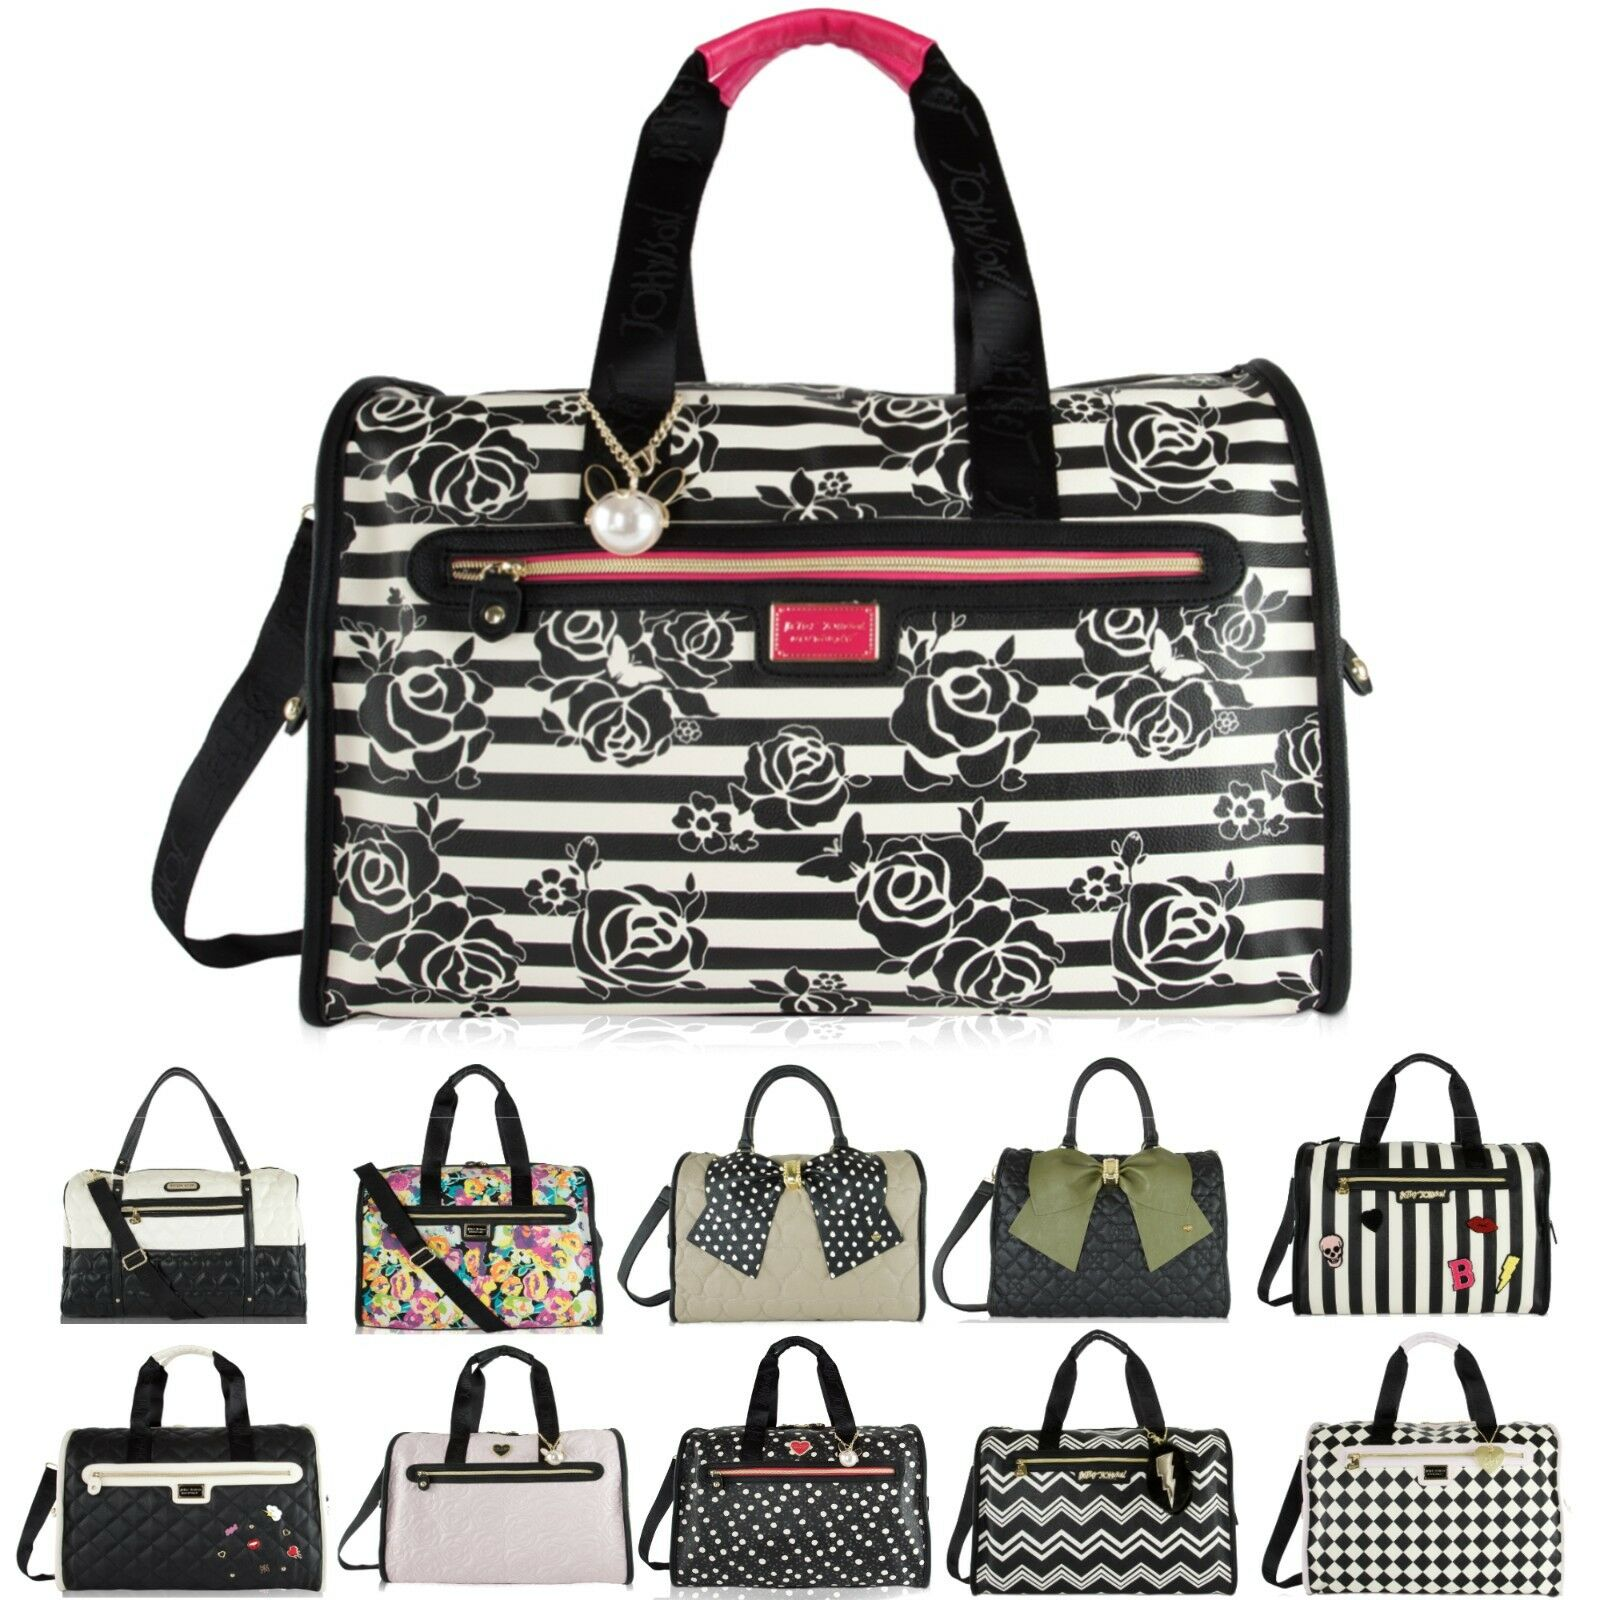 Betsey Johnson Cheetah Leopard Weekender Duffel Carry On Travel Bag Rare Ebay